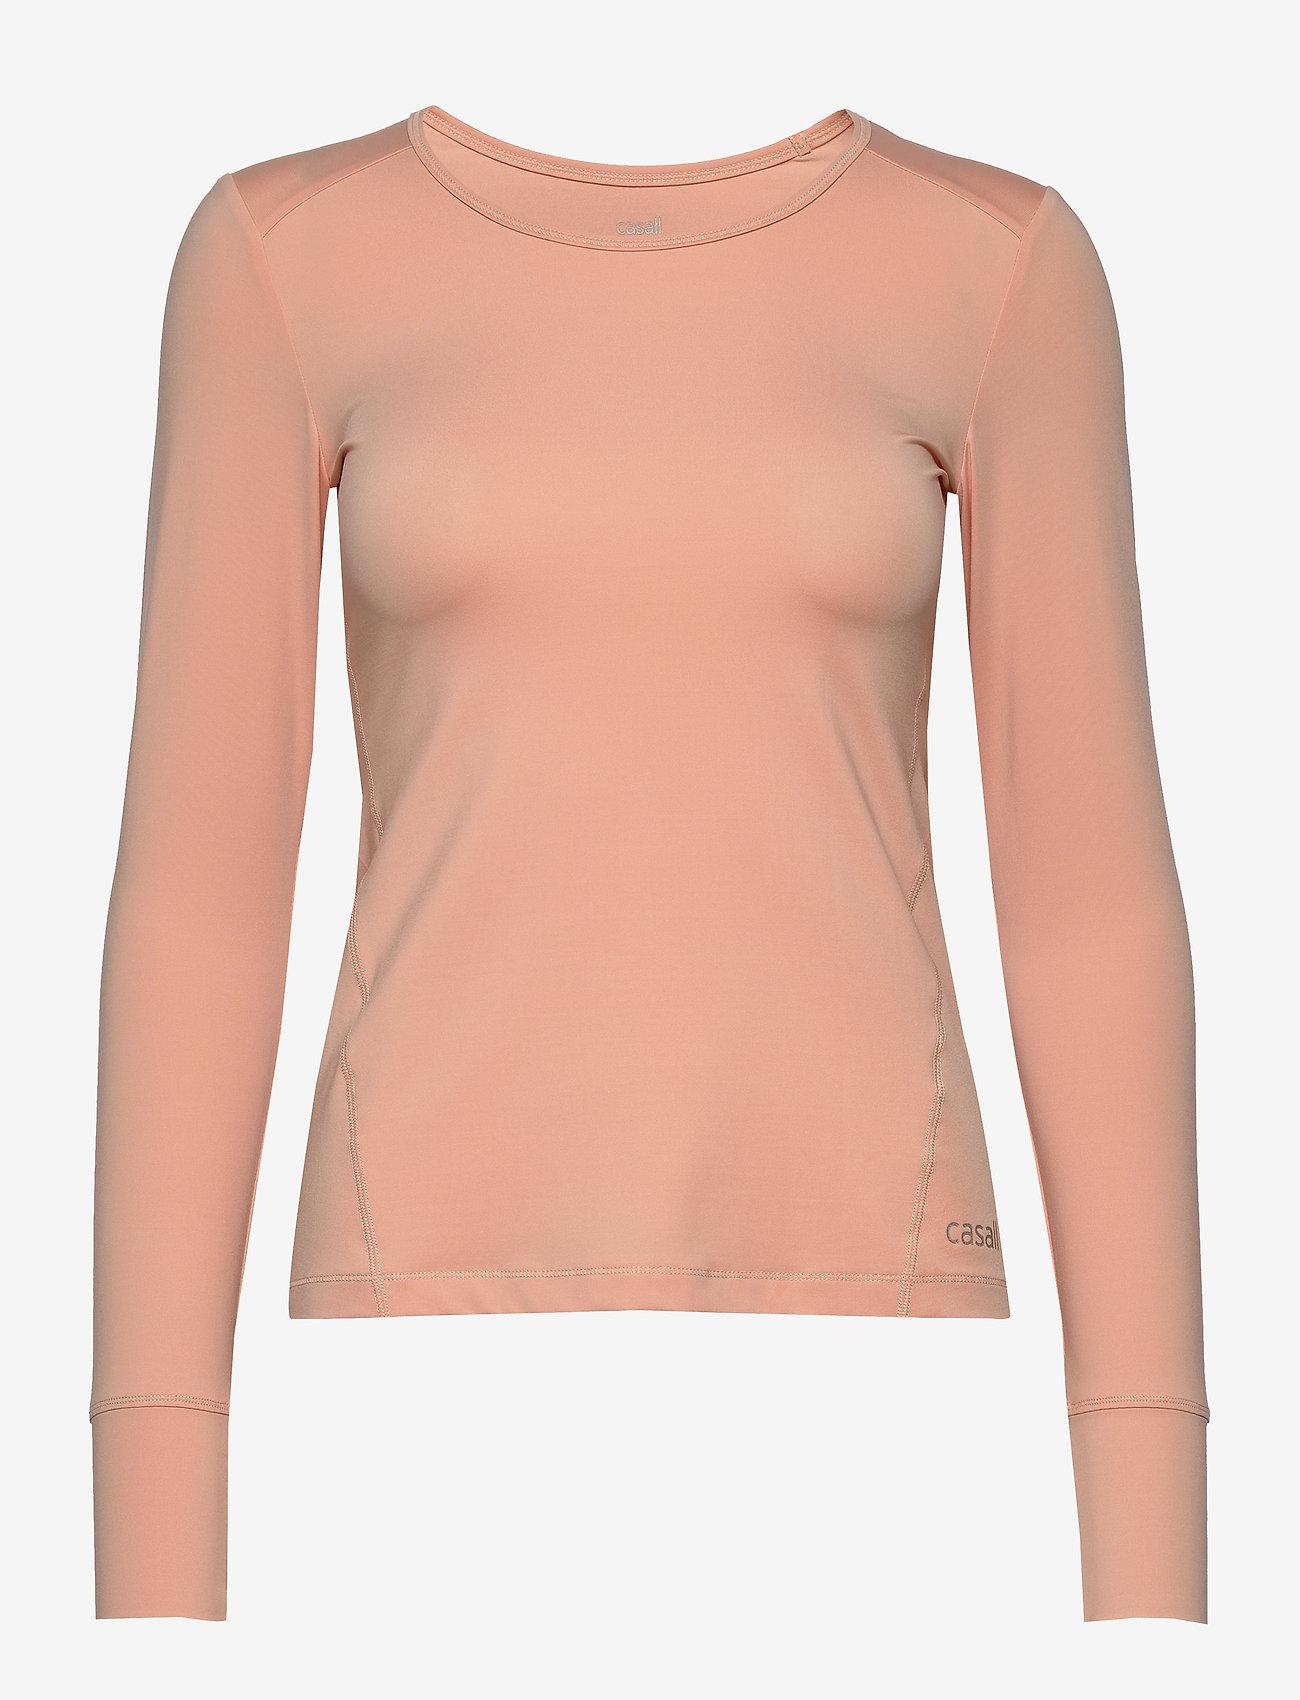 Casall - Essential long sleeve - bluzki z długim rękawem - trigger pink - 0